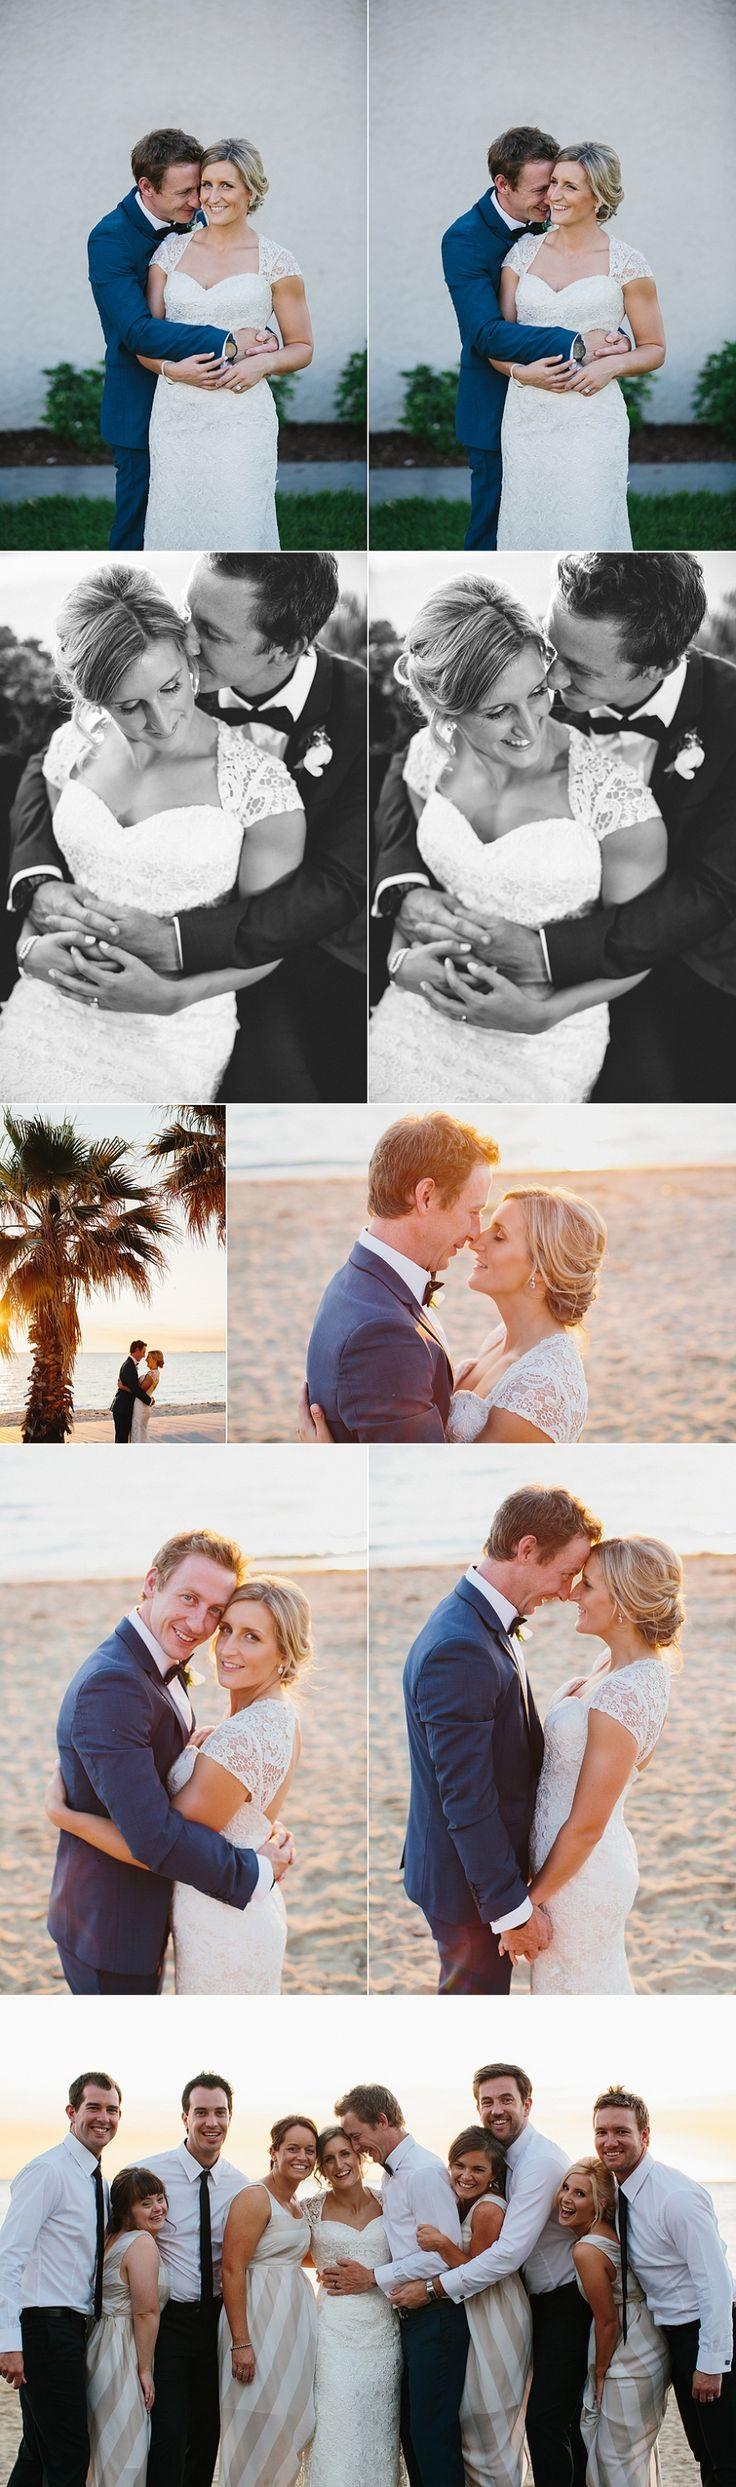 damian + lucy | encore st kilda sea baths wedding » VANESSA NORRIS PHOTOGRAPHY